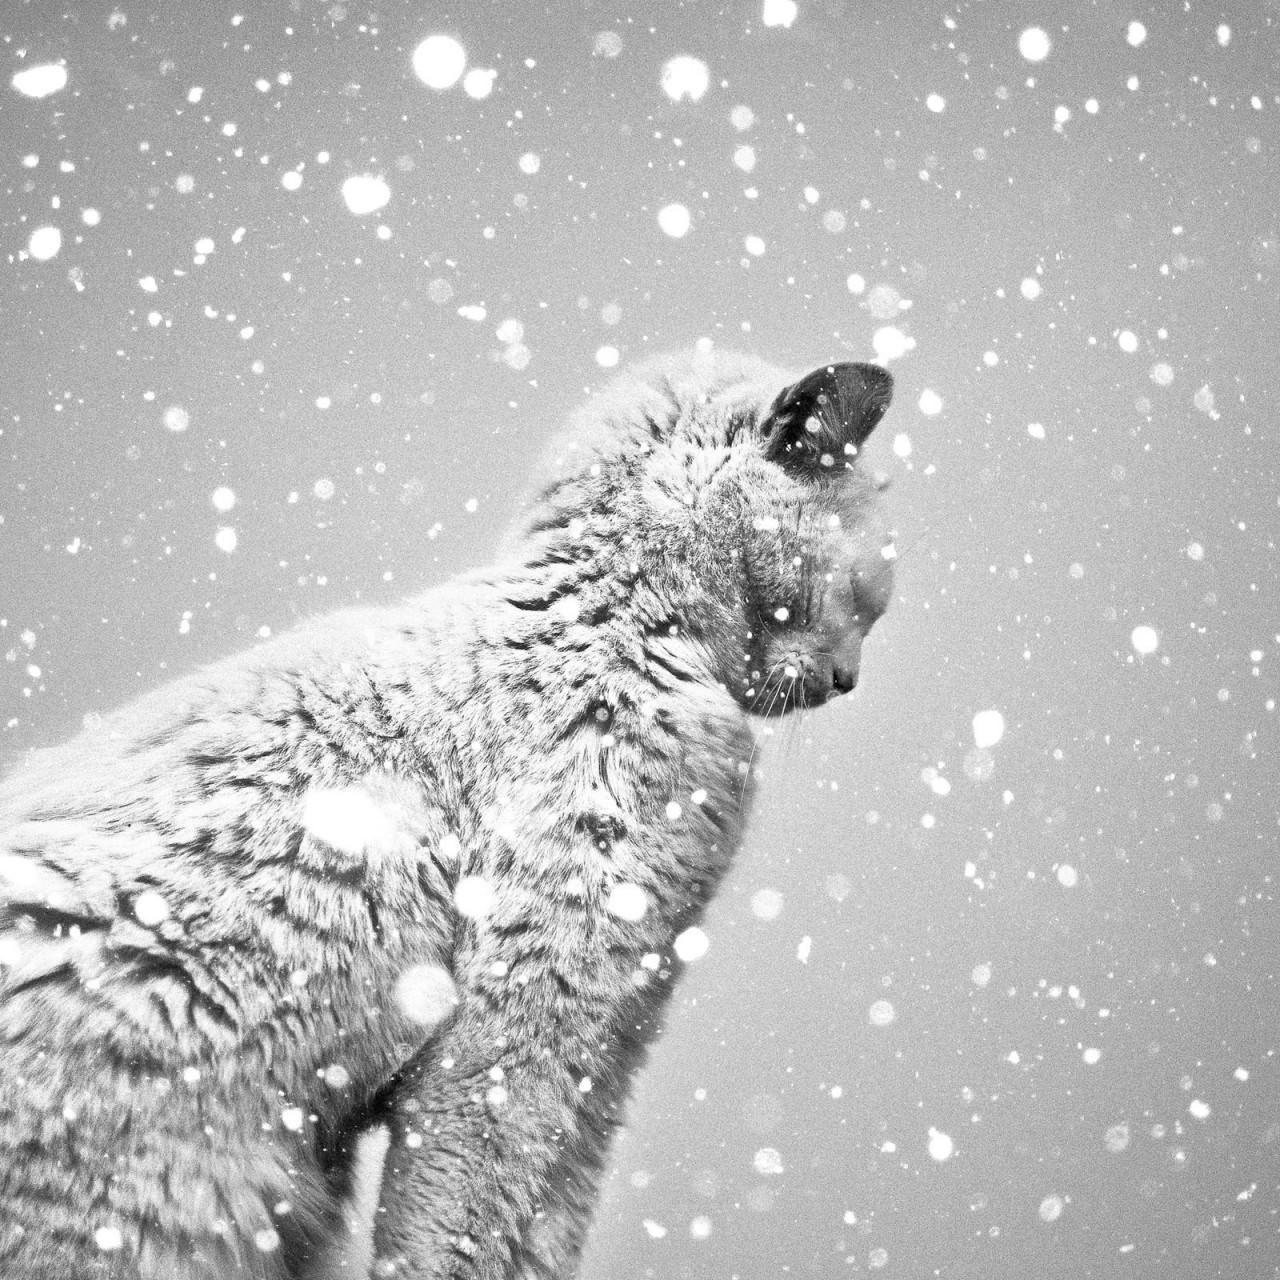 Кот. Фотограф Бенуа Корти